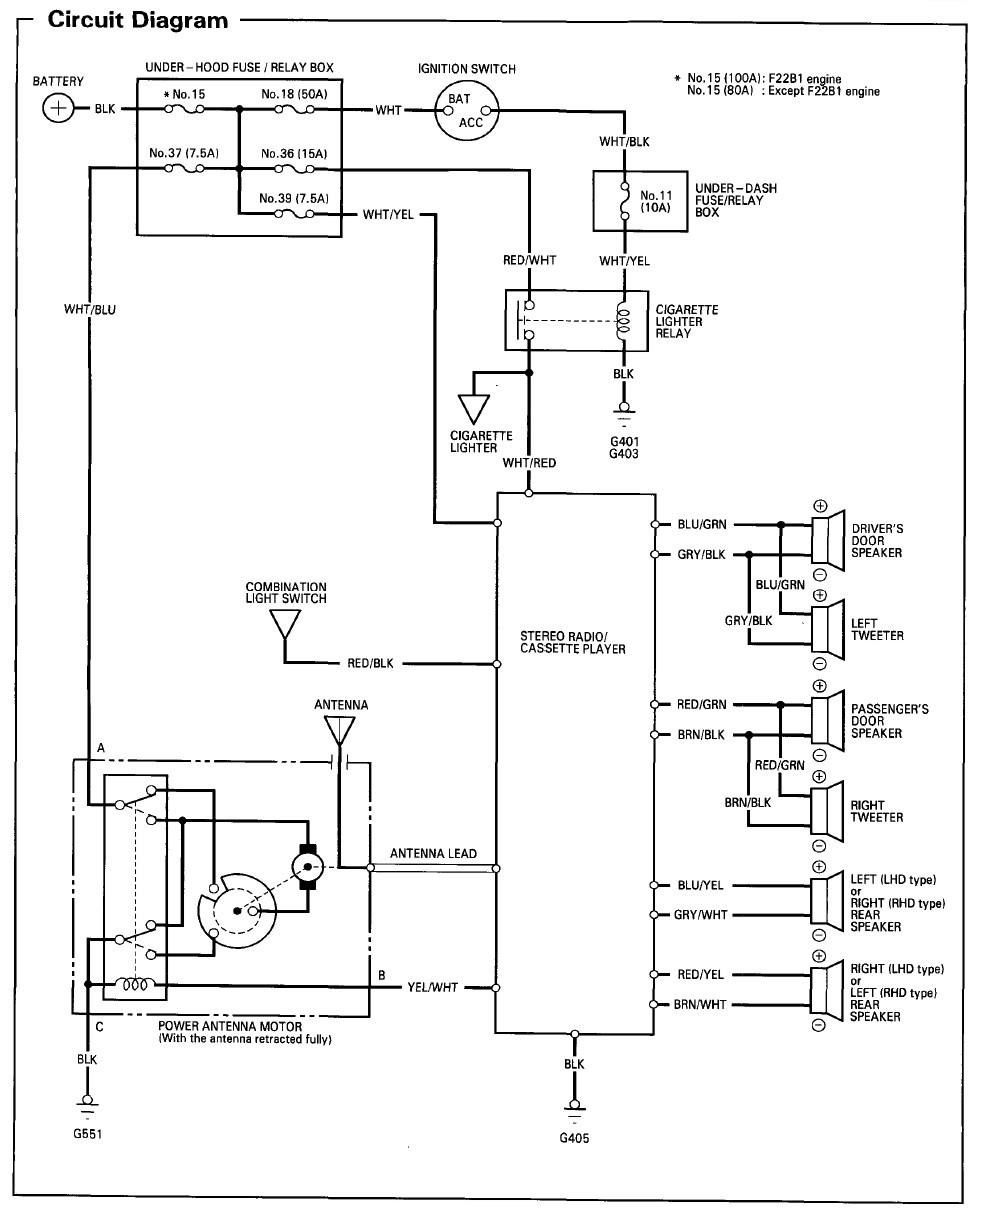 Honda Accord Wiring Diagram 2005 from static-cdn.imageservice.cloud